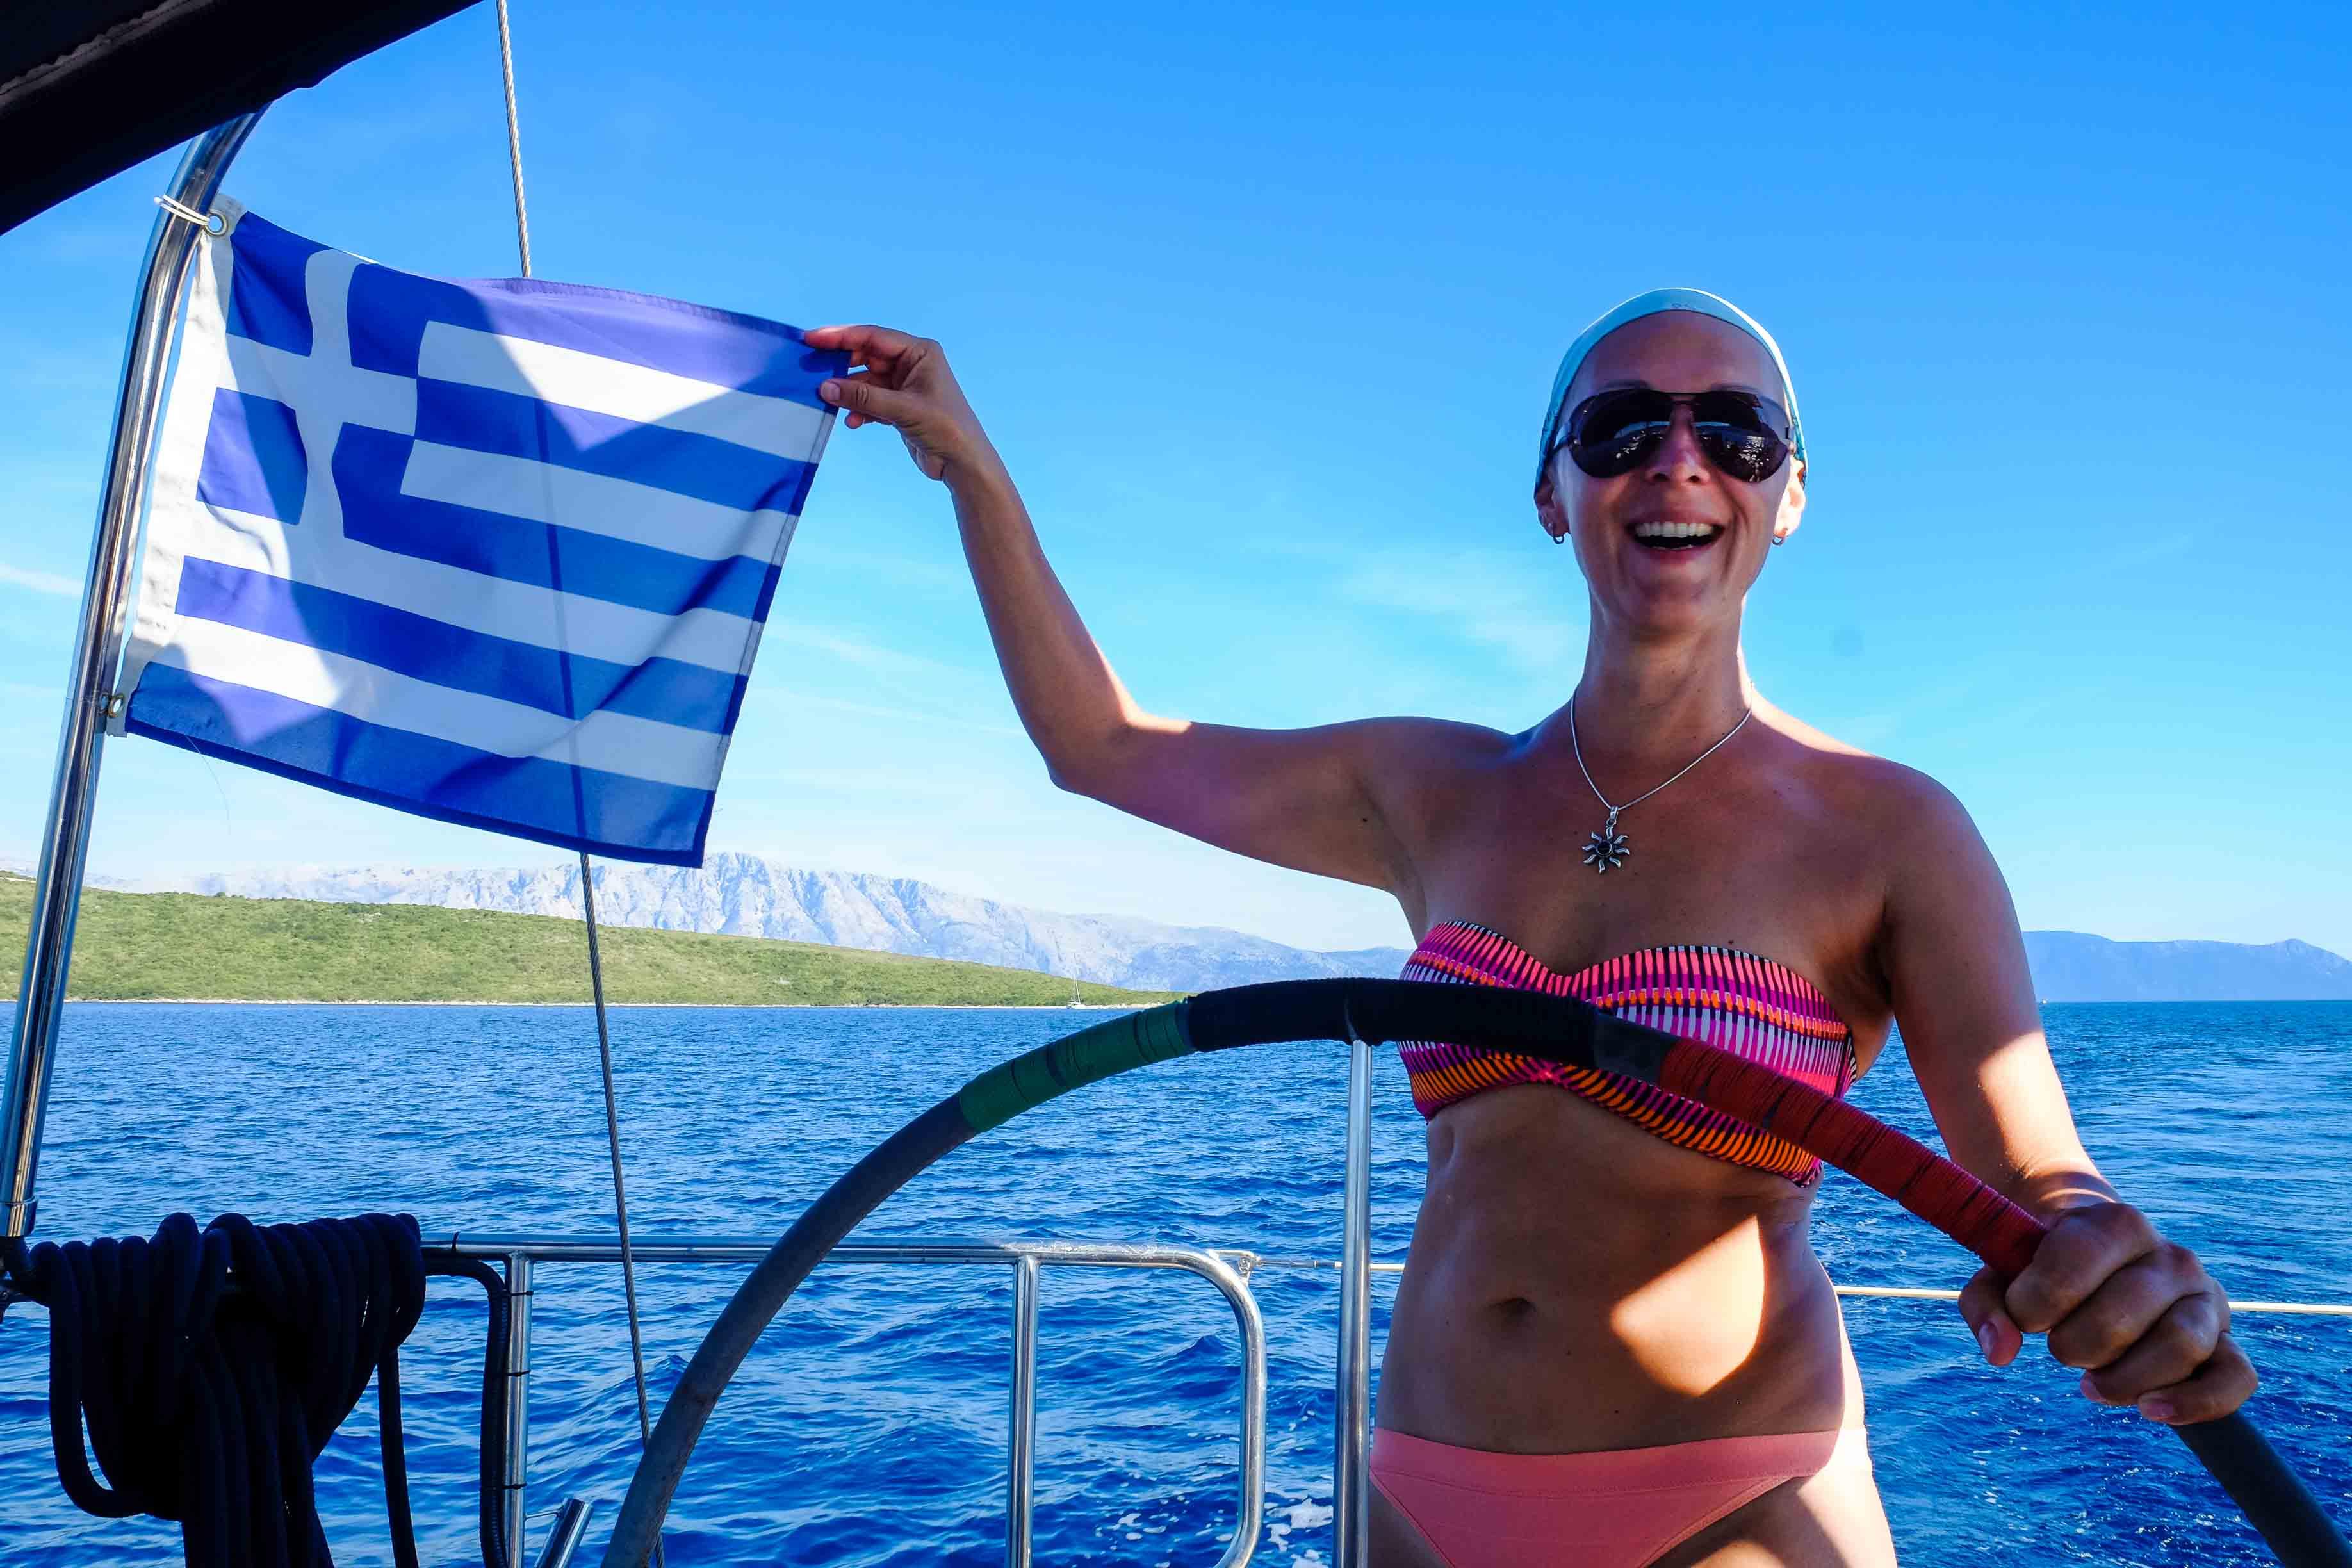 марианна кочевых капитан яхты Медуза